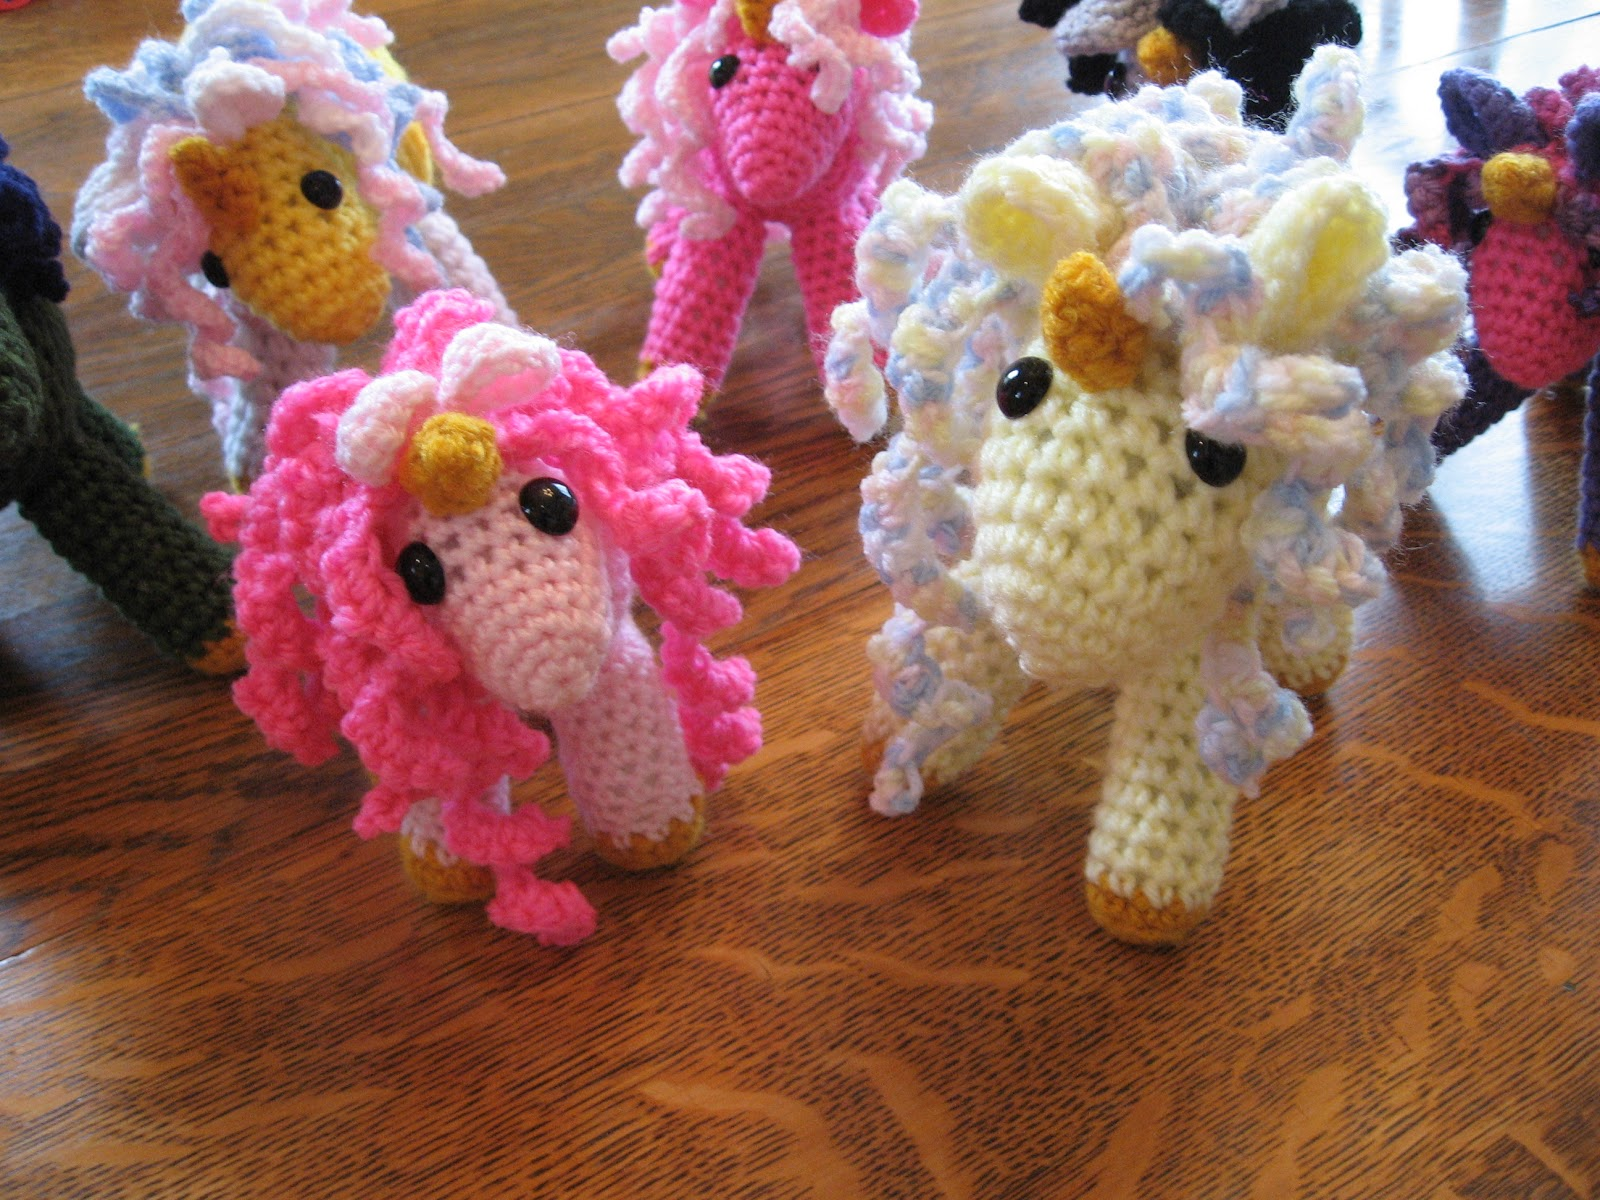 Free Amigurumi Unicorn Pattern : The crooked needle reuben the pink fluffy unicorn dancing on a